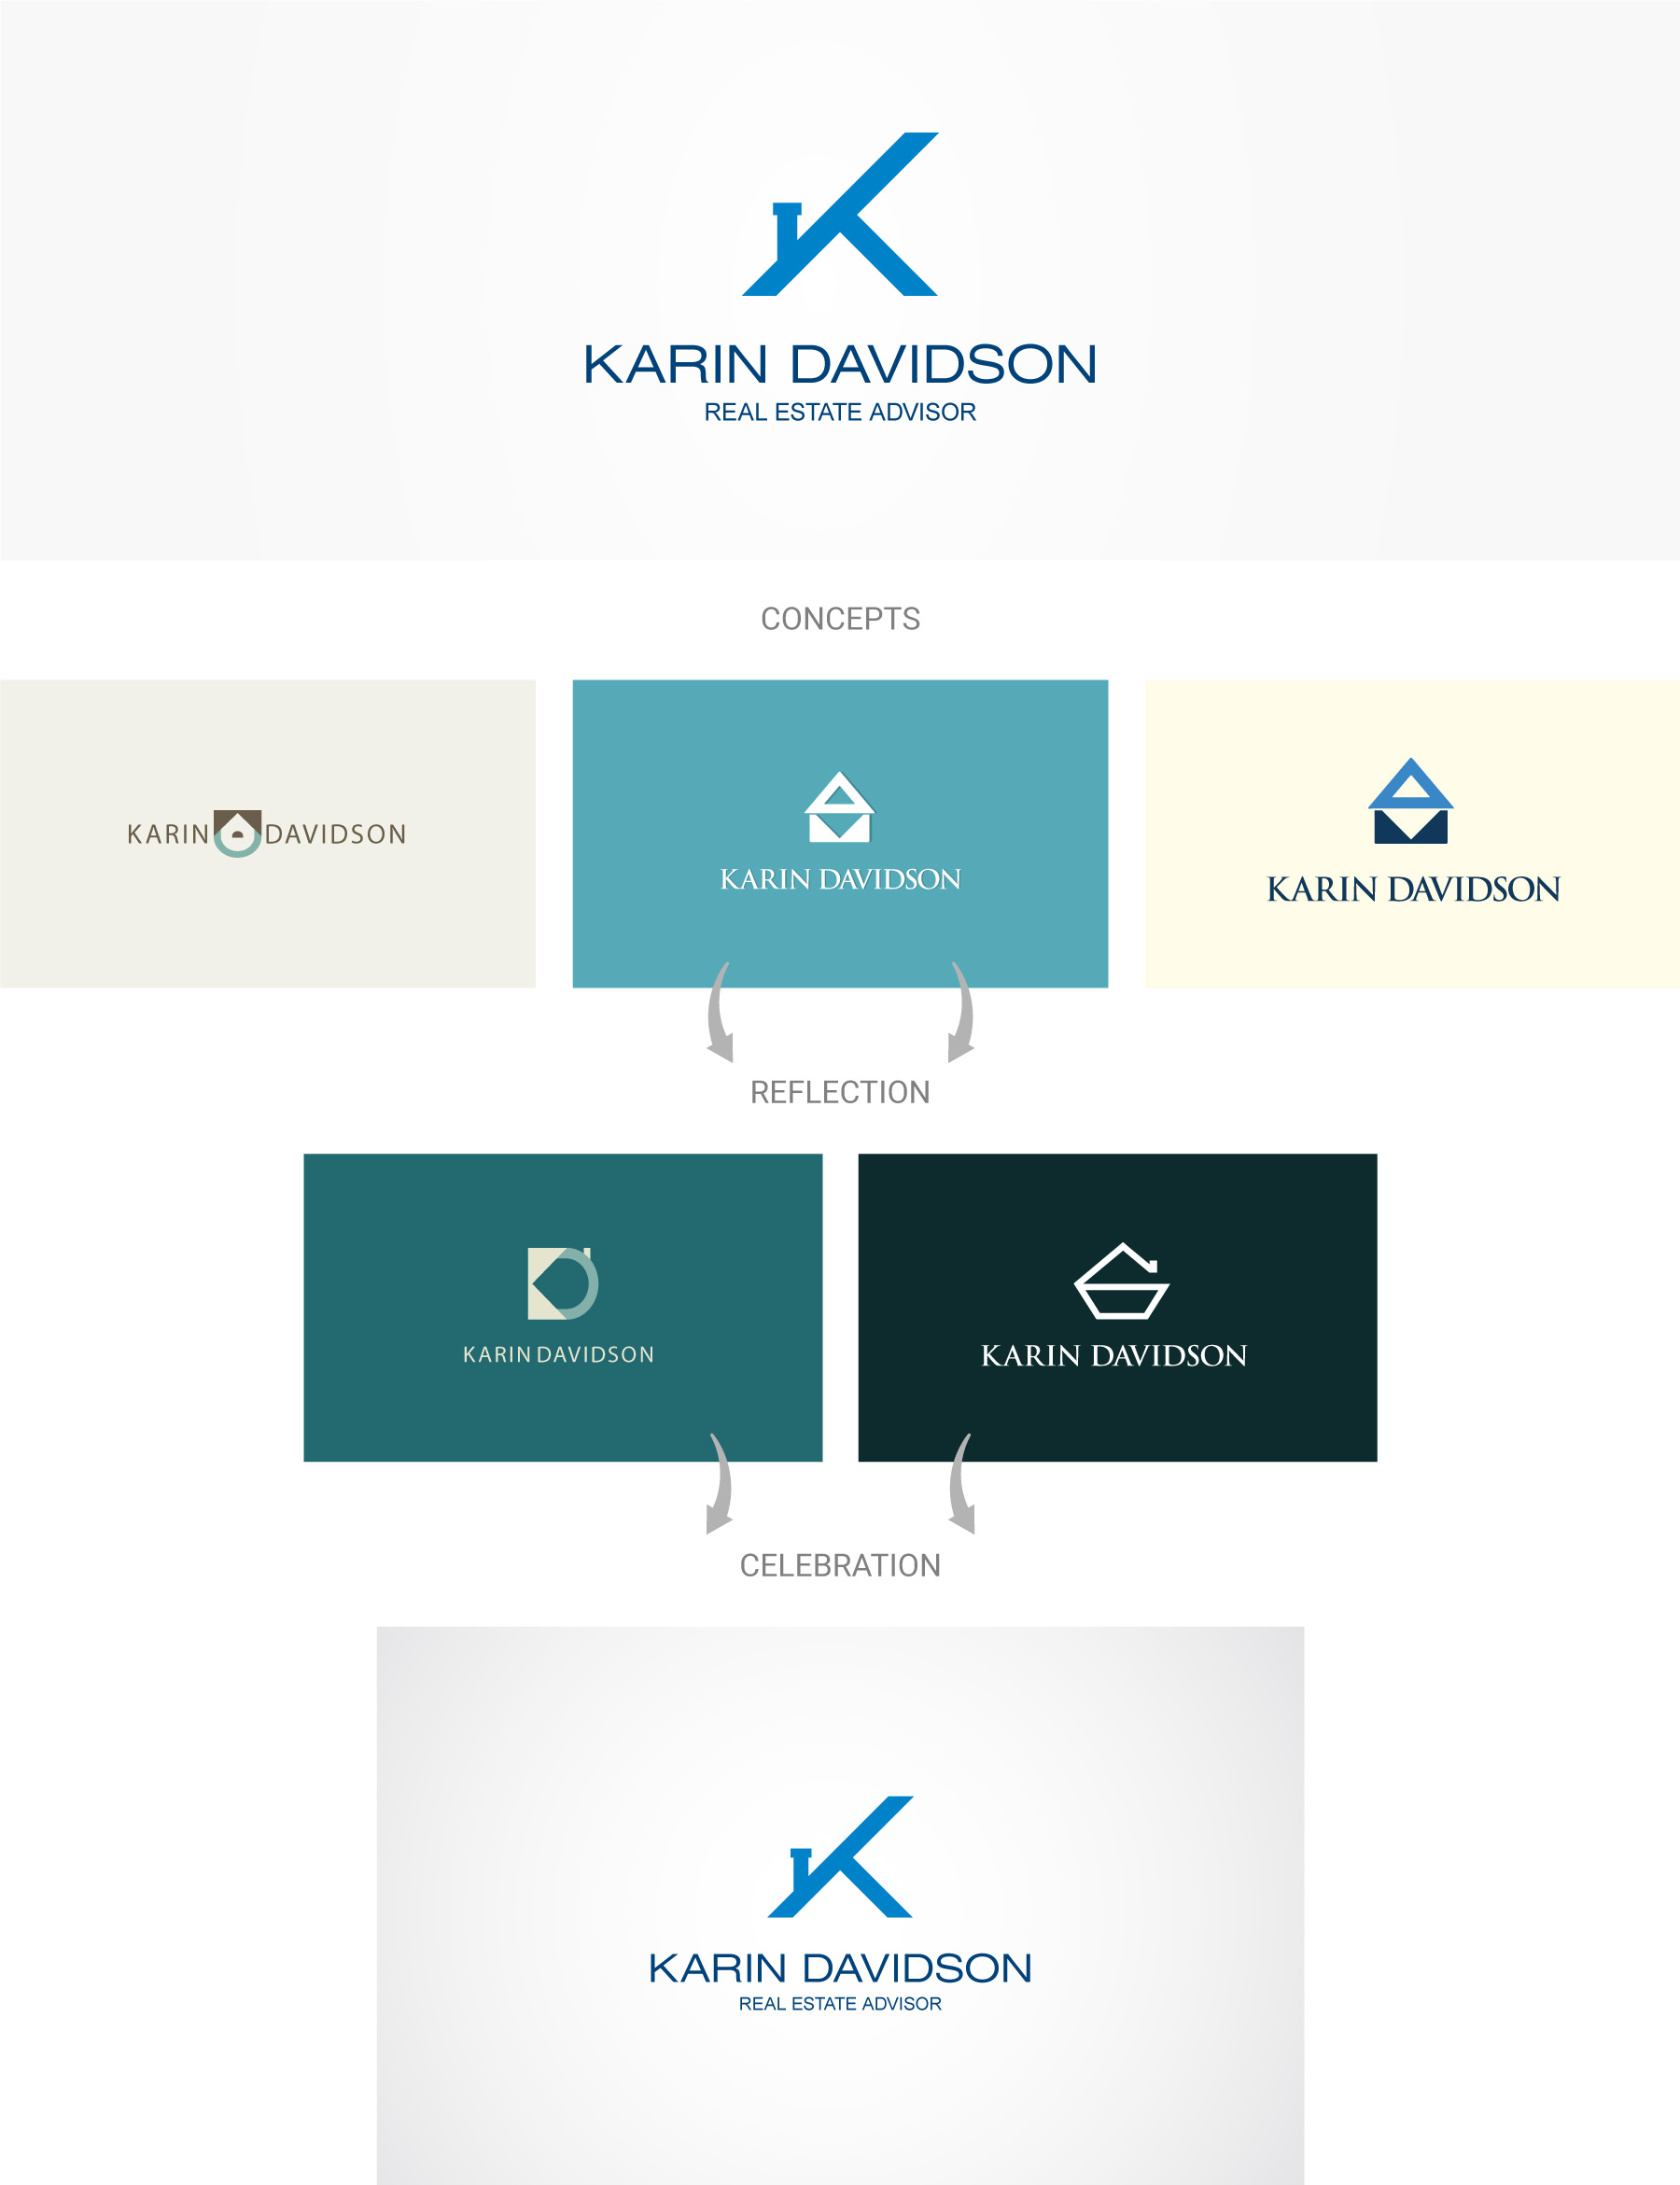 Karin-davidson-logo-design